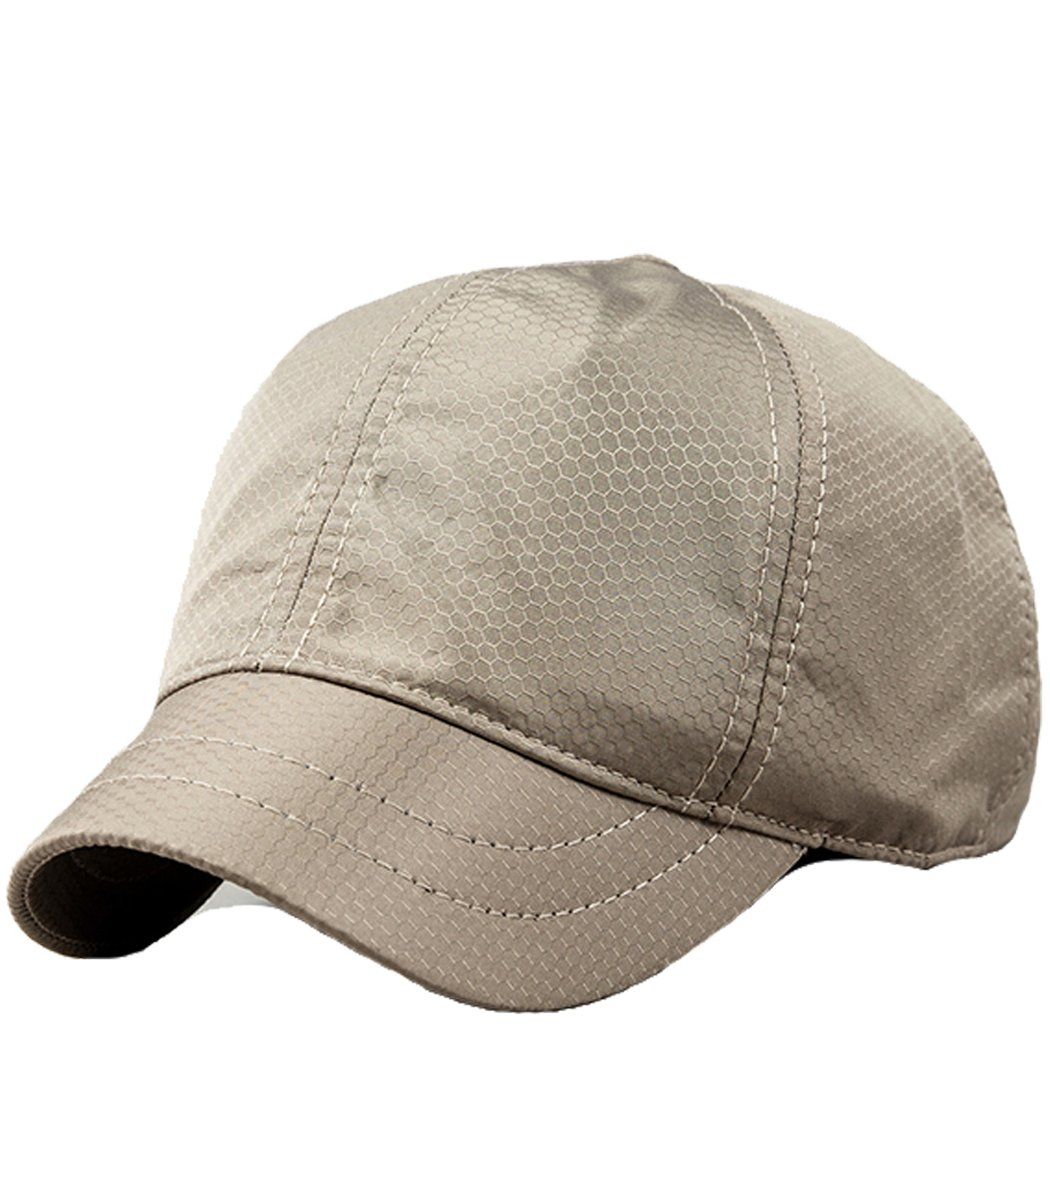 Clecibor Unisex Baseball Cap Summer Breathable Lattice Adjustable Quick Dry Outdoor Hat